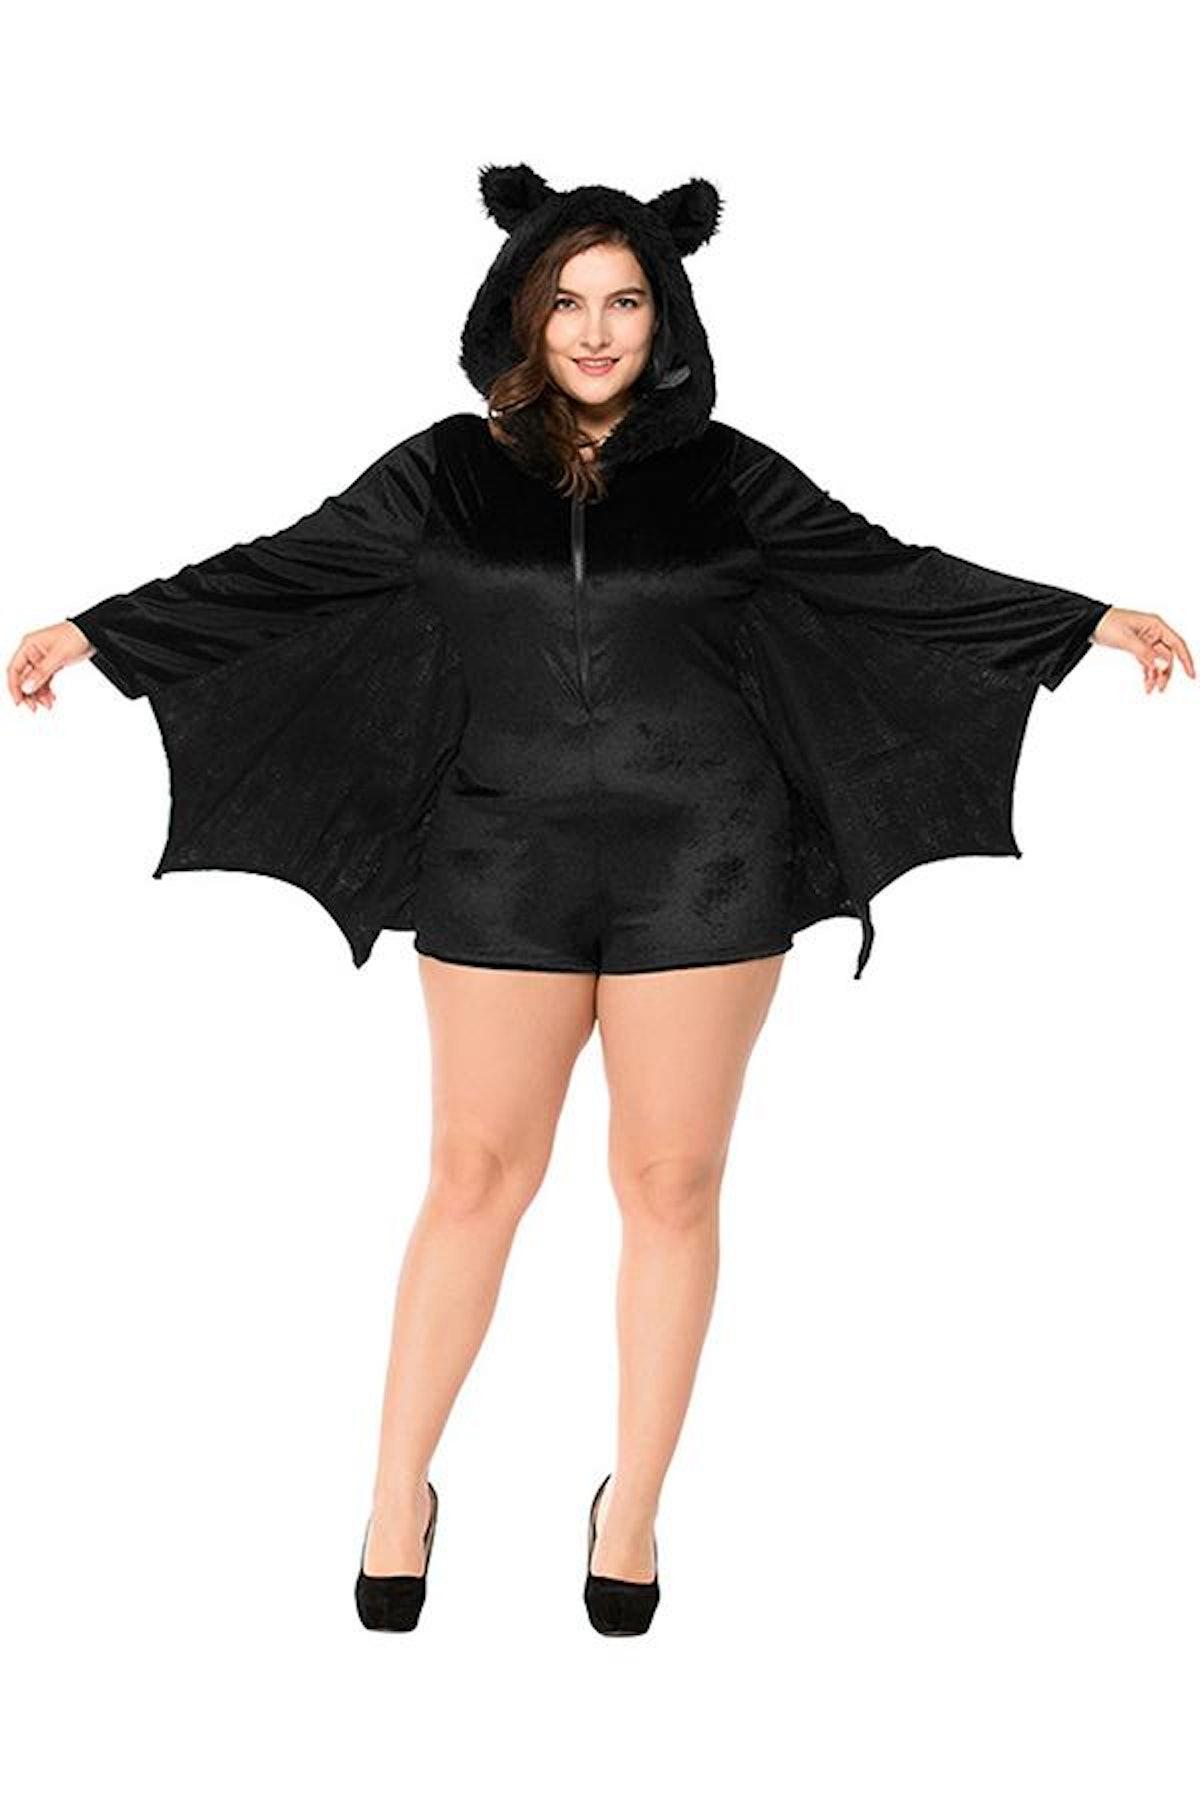 Halloween Plus Size Womens' Bat Costume